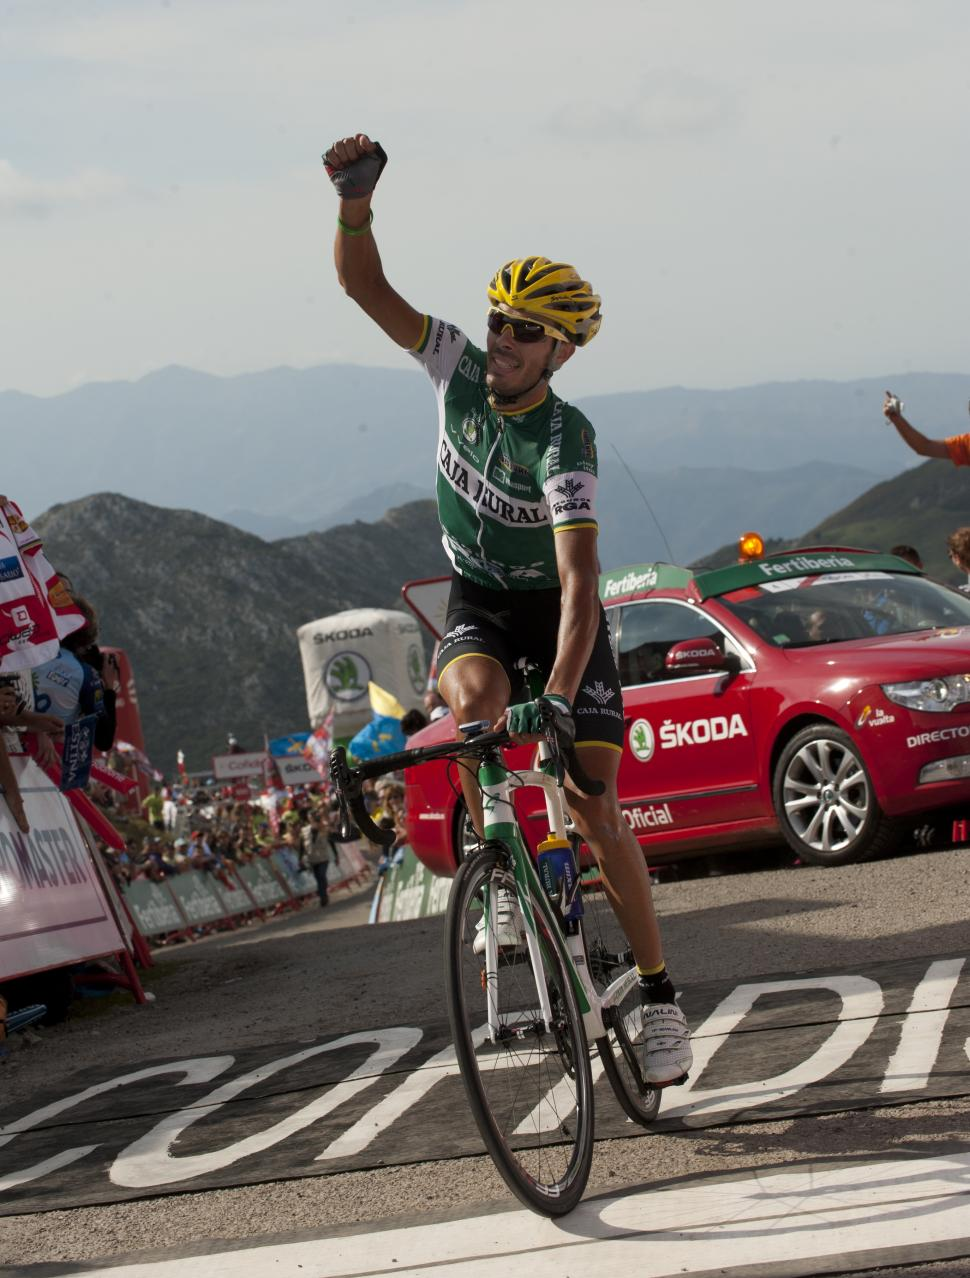 Vuelta 2012 S15 Antonio Piedra wins (copyright Unipublic:Graham Watson)